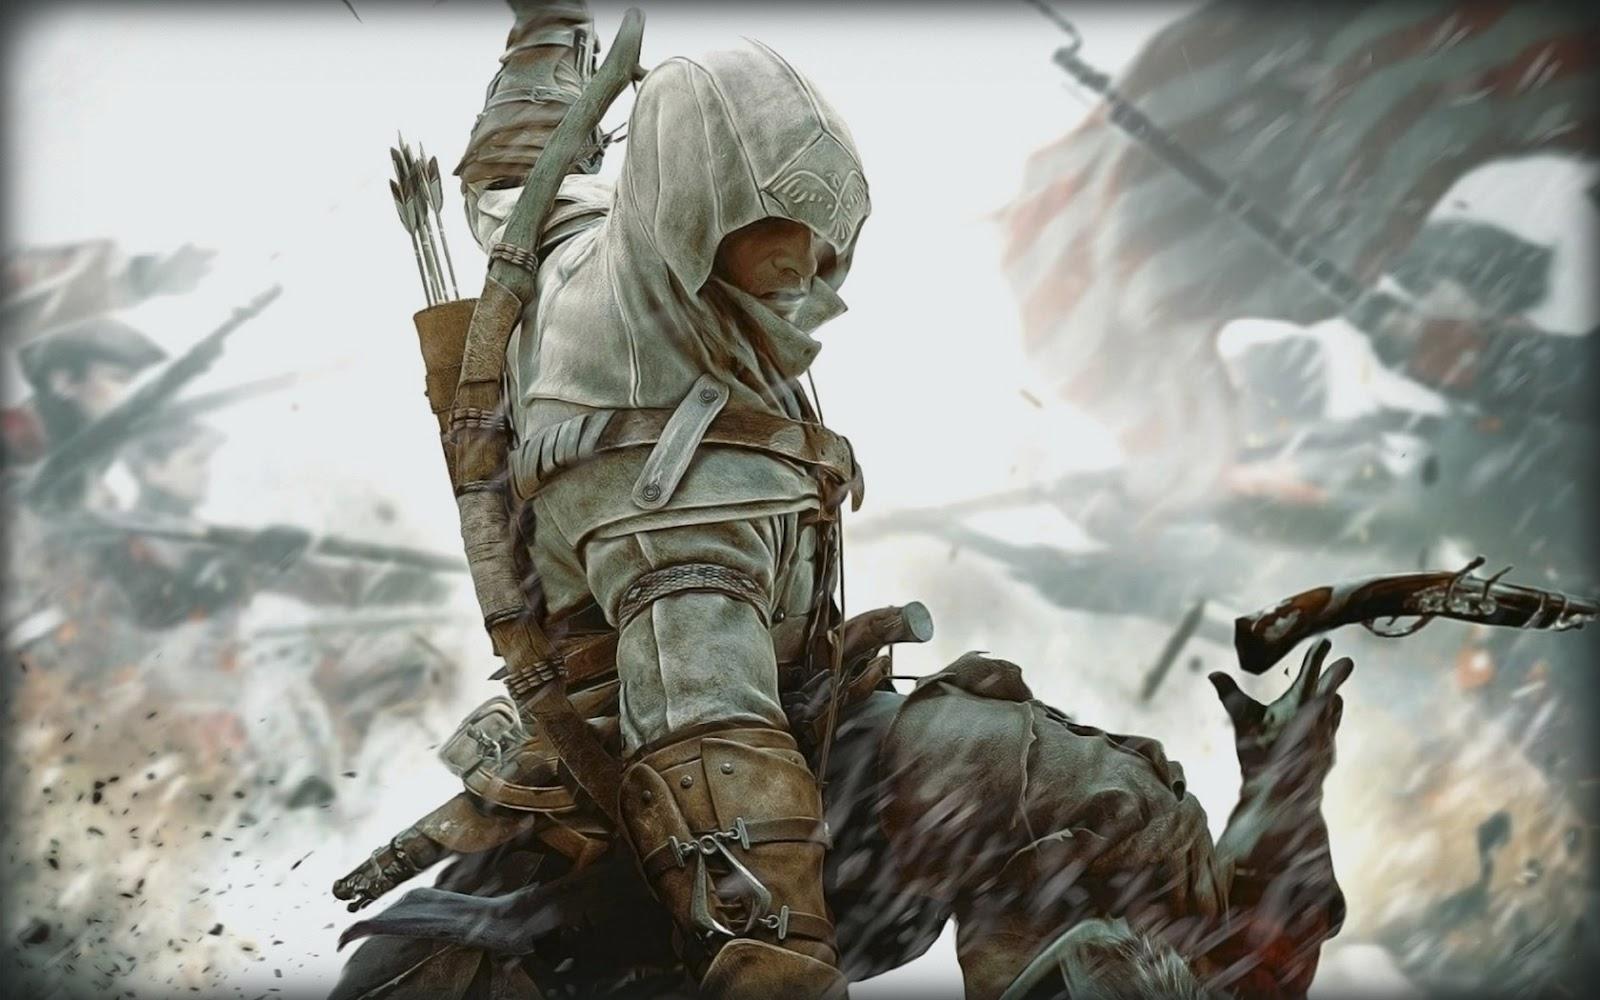 http://3.bp.blogspot.com/-BLc-tLMDvZY/T1TOxqxZ5cI/AAAAAAAAFxs/0jEVmRnH0iA/s1600/Assassins_creed_3_wallpapers+(2).jpg